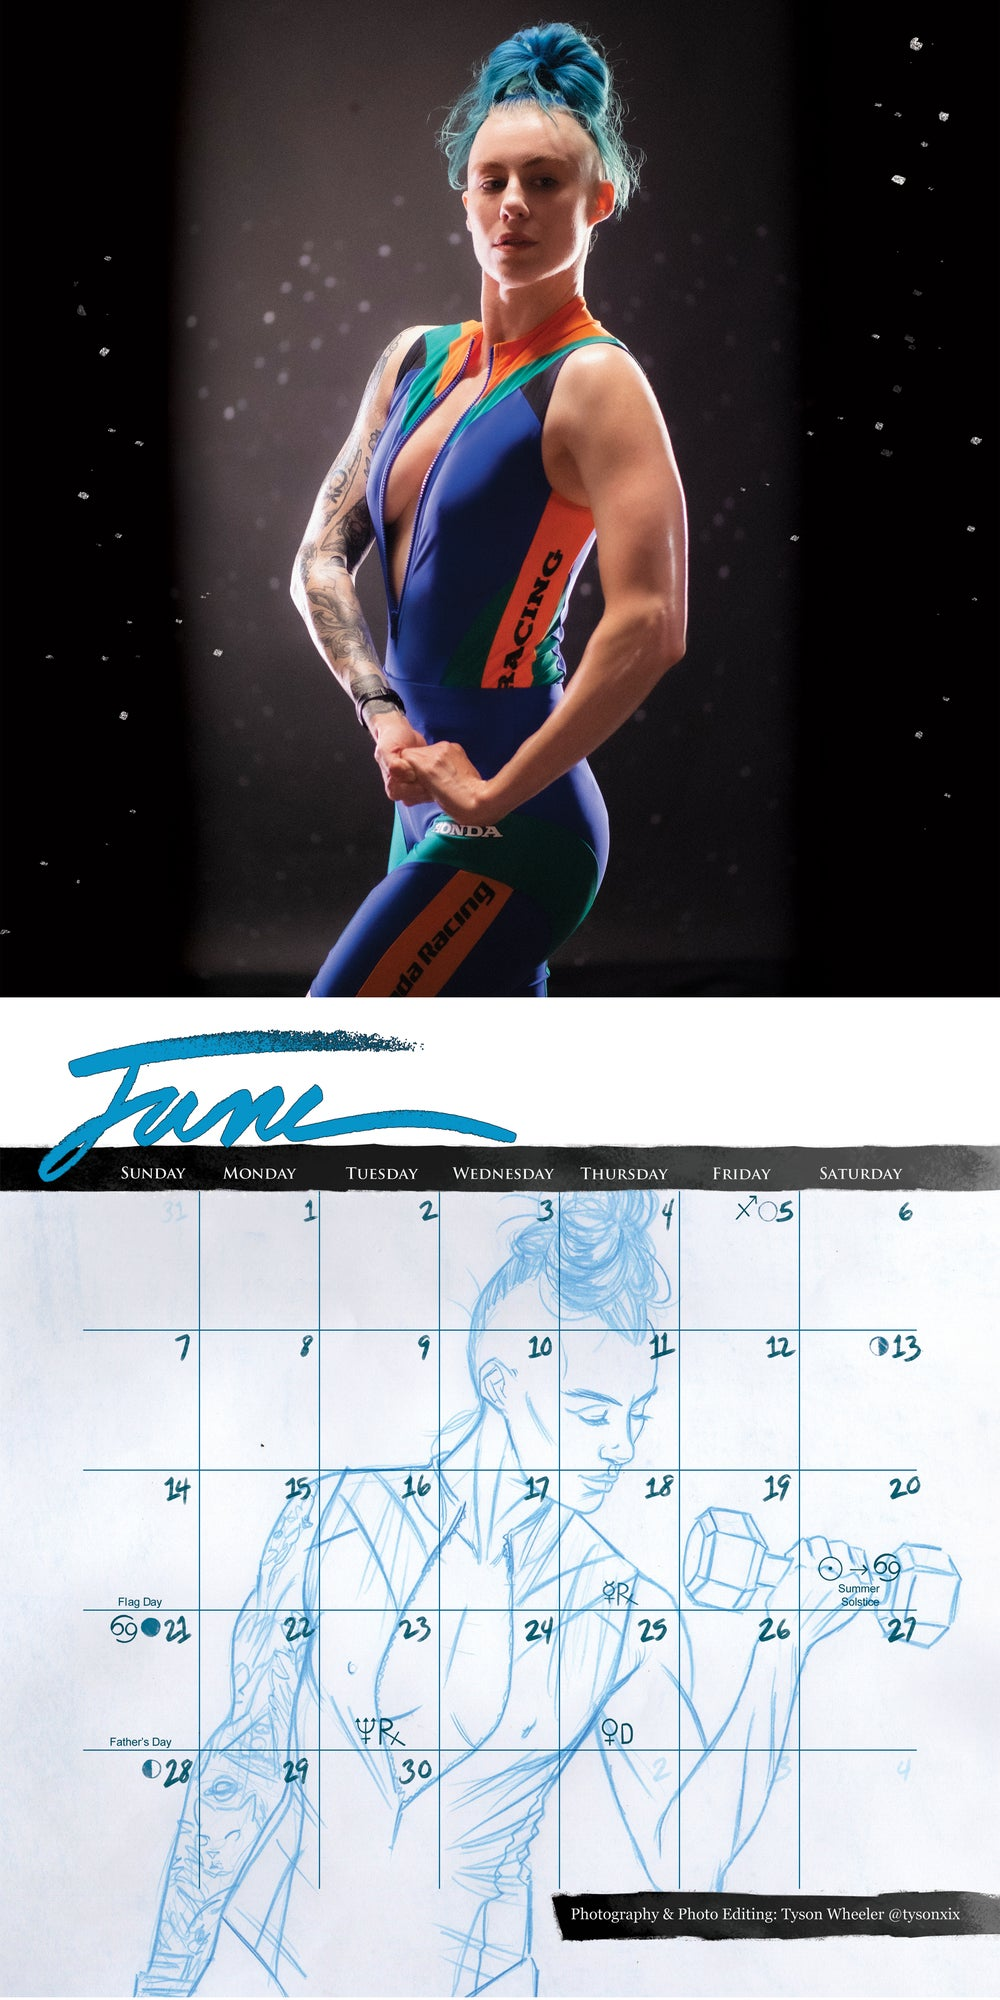 Official Danika XIX 2020 Calendar: Drawn to Life